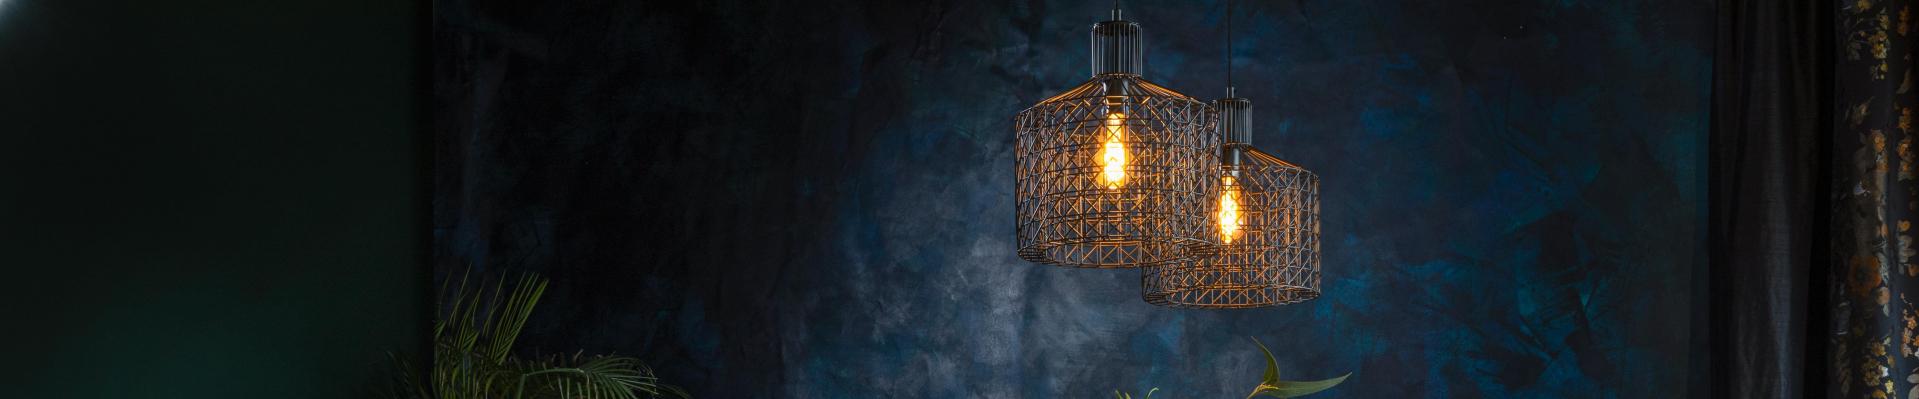 Dutchbone hanglampen